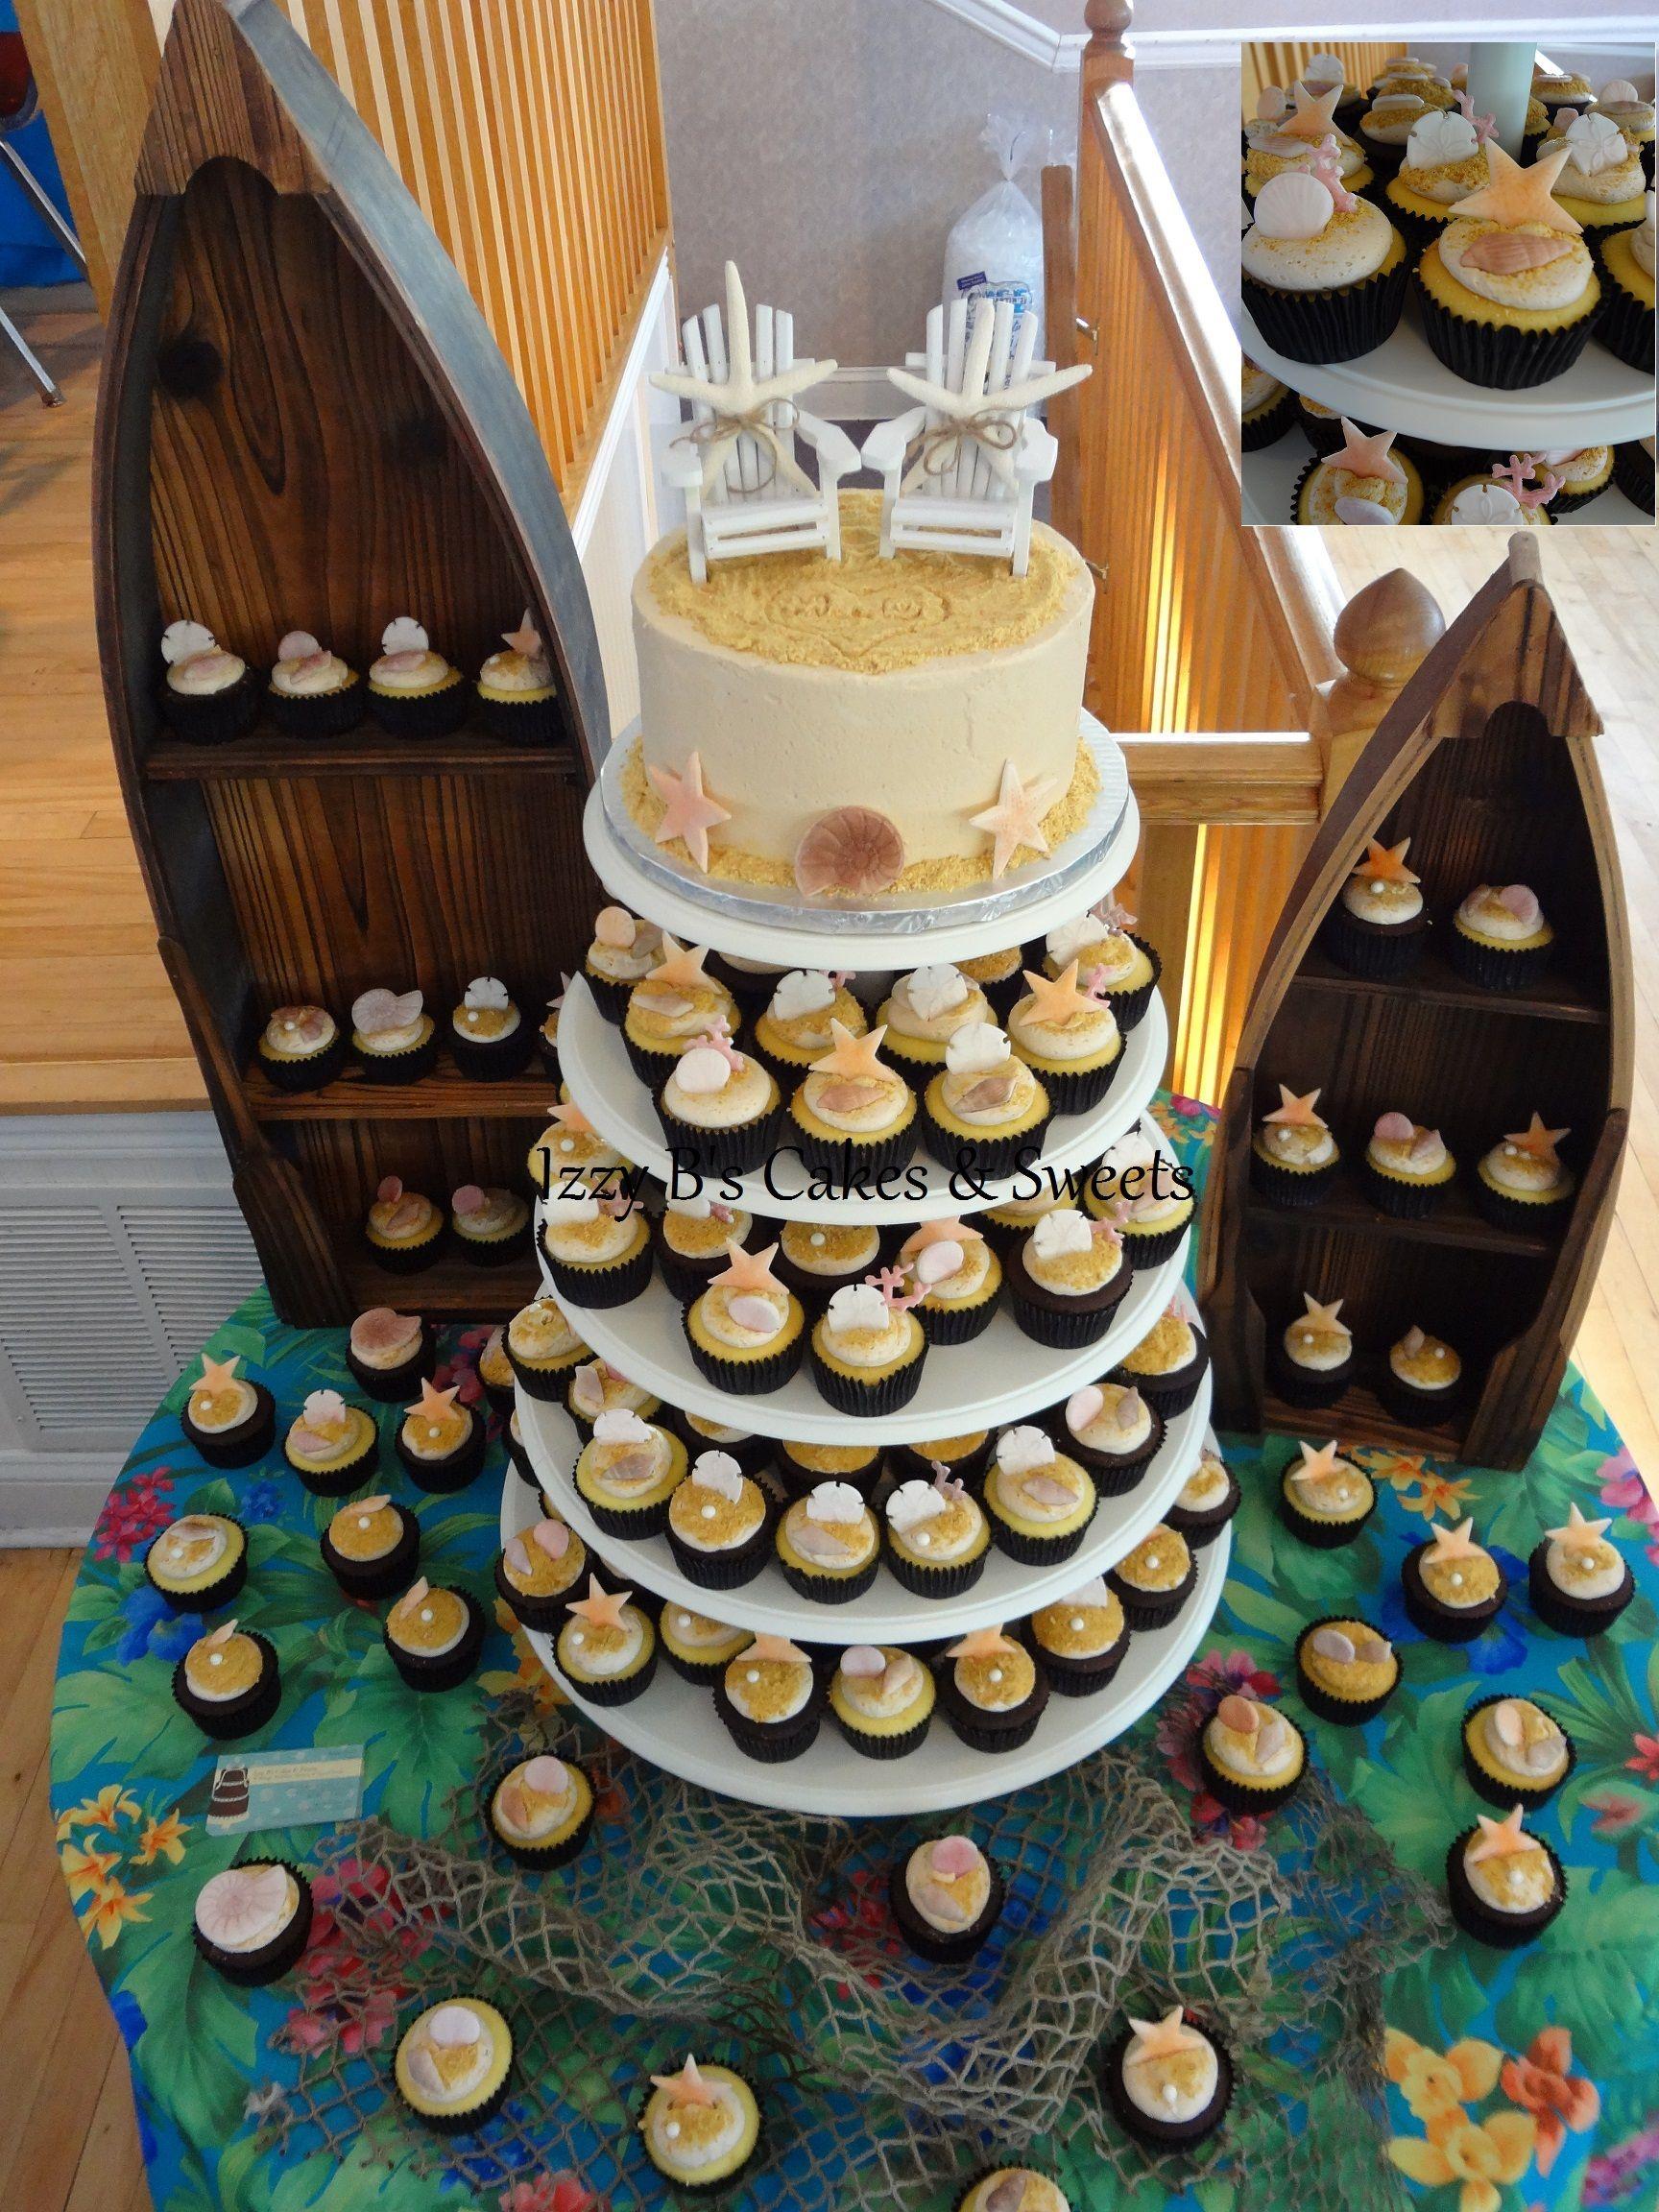 Beach Themed Wedding Cake And Cupcakes All Seashells Are Edible